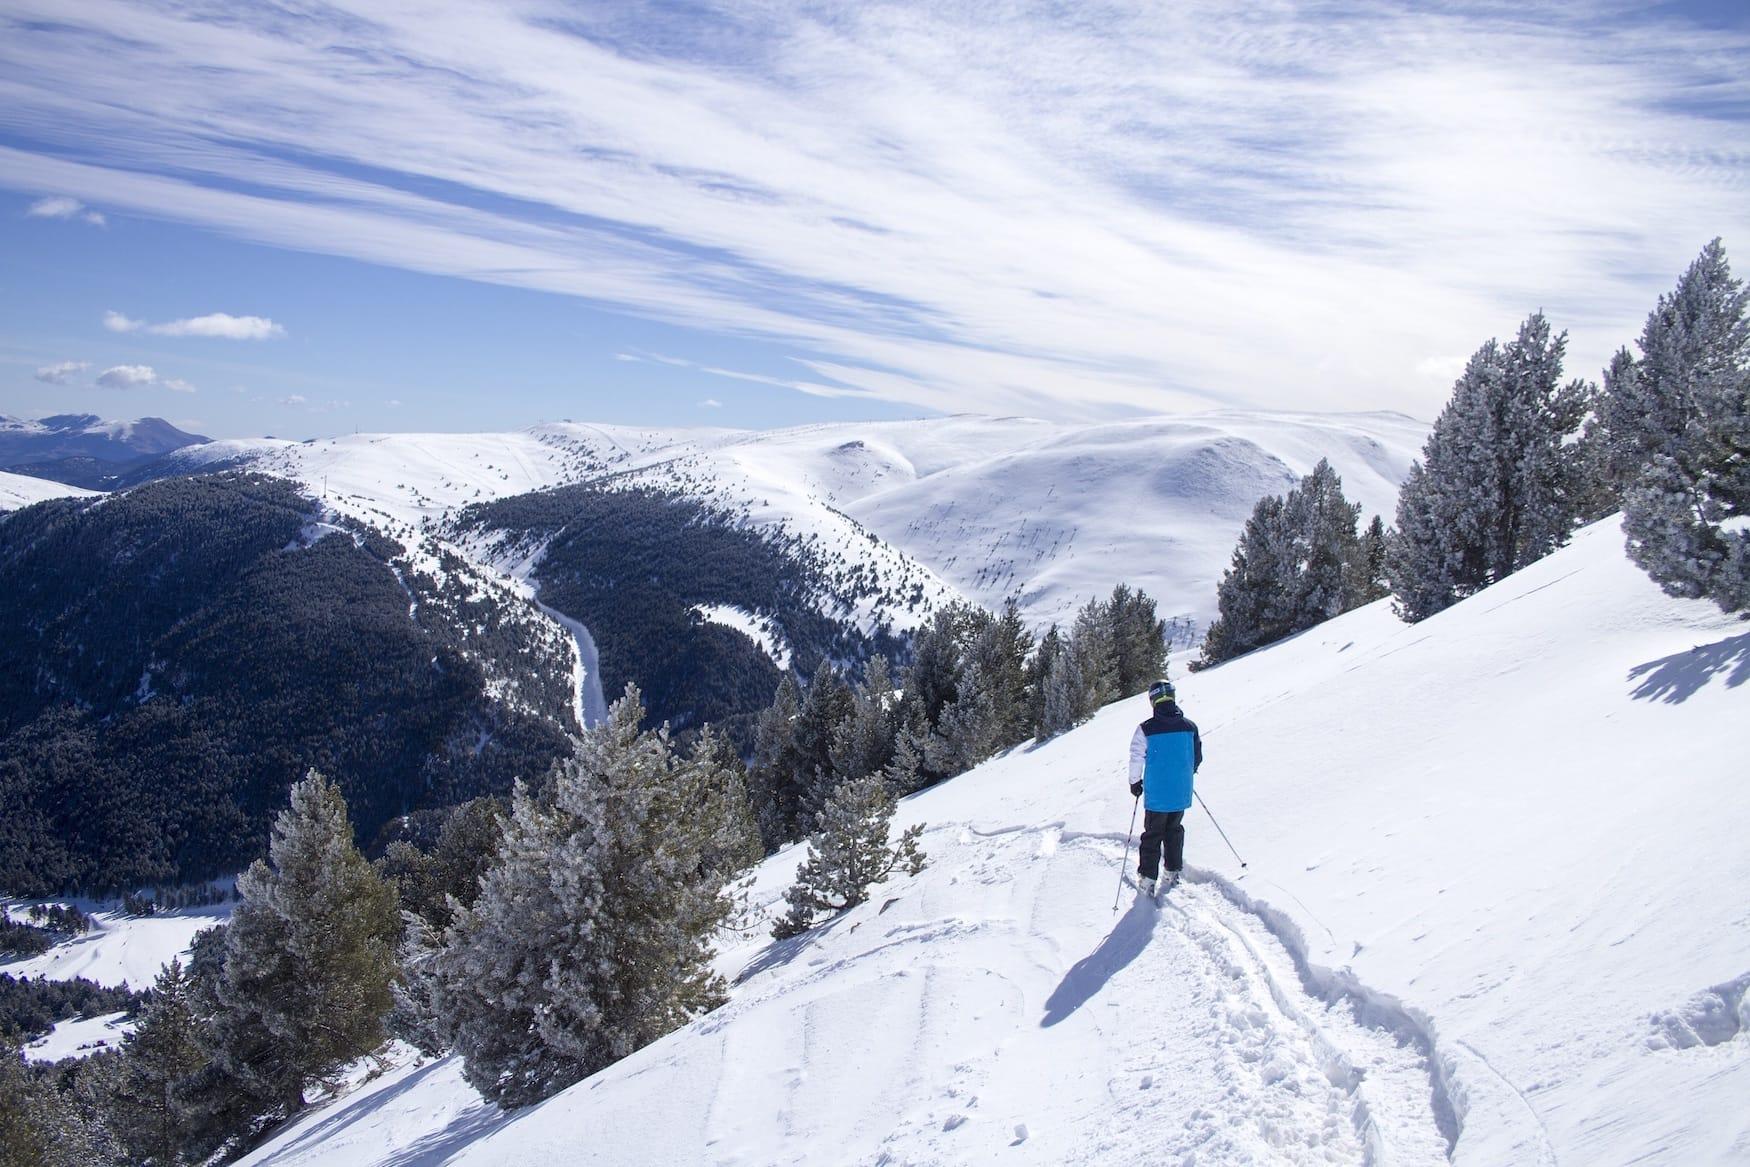 Katalonien aktiv erleben: Skifahren in La Molin in den Pyrenäen